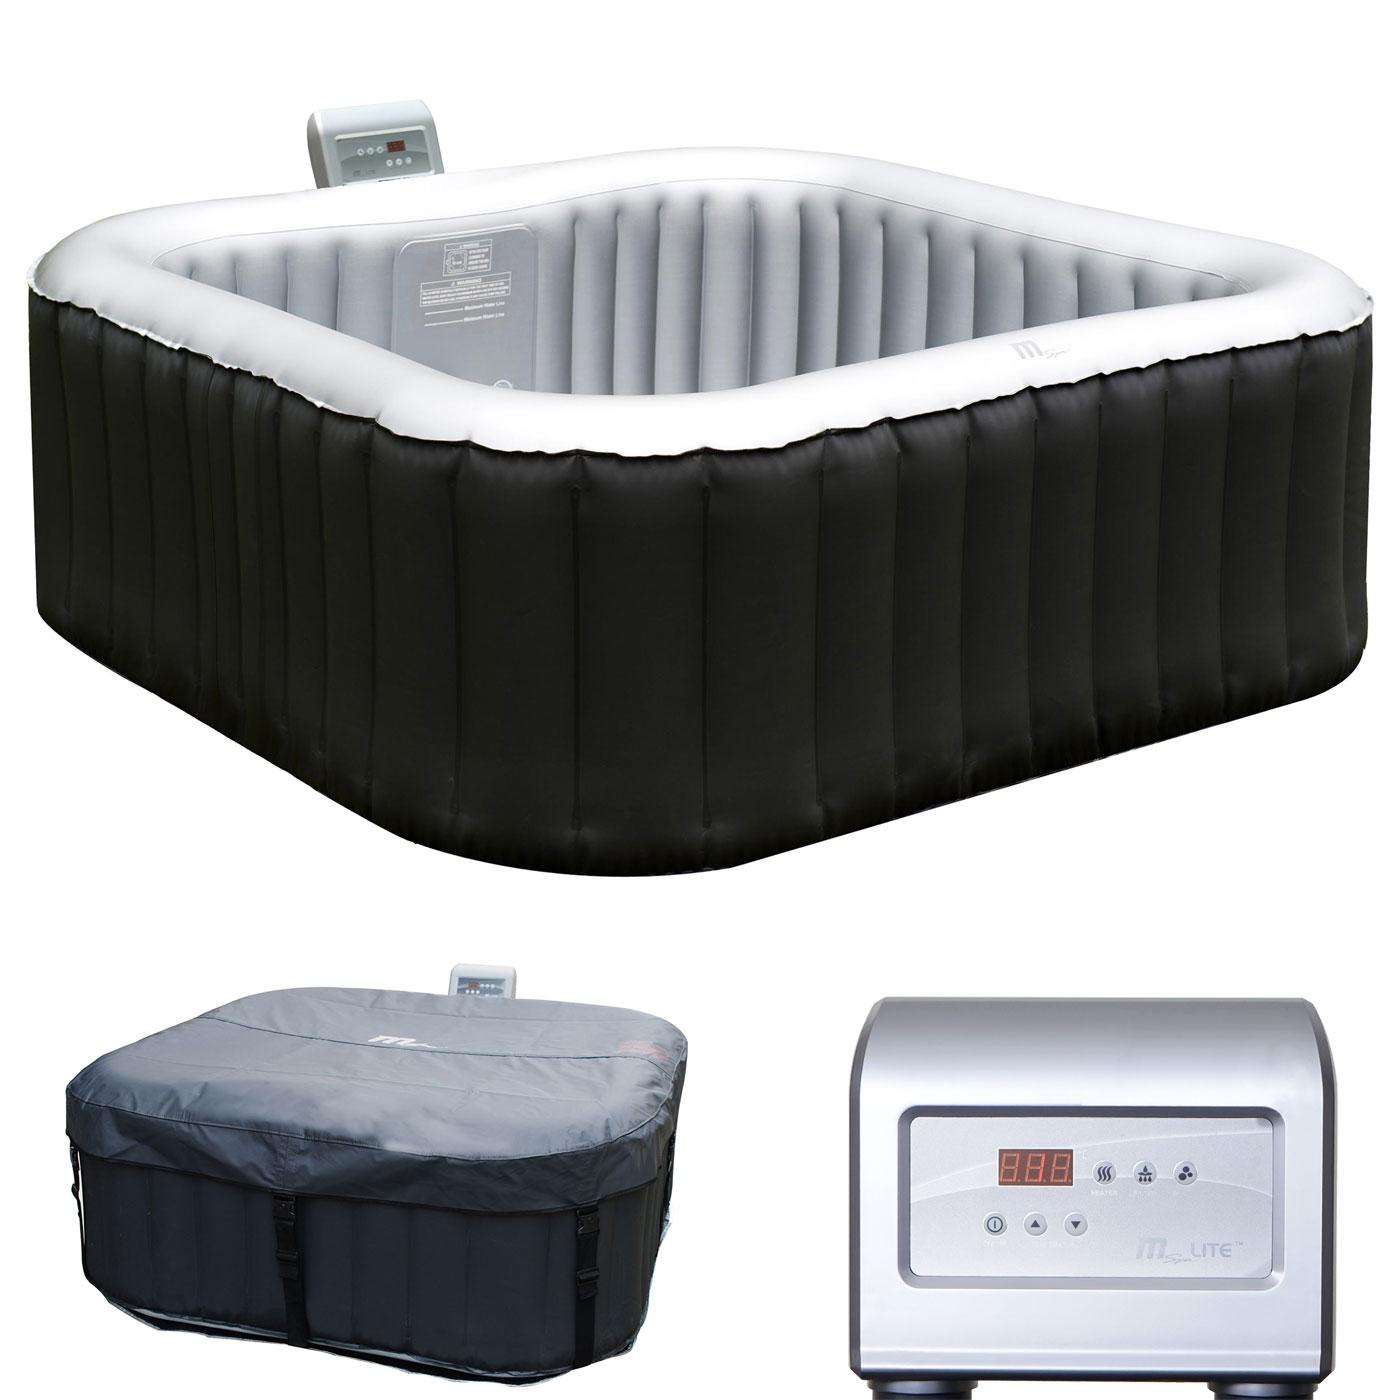 whirlpool mspa hwc a62 4 2 personen in outdoor heizbar aufblasbar 185x185cm ebay. Black Bedroom Furniture Sets. Home Design Ideas